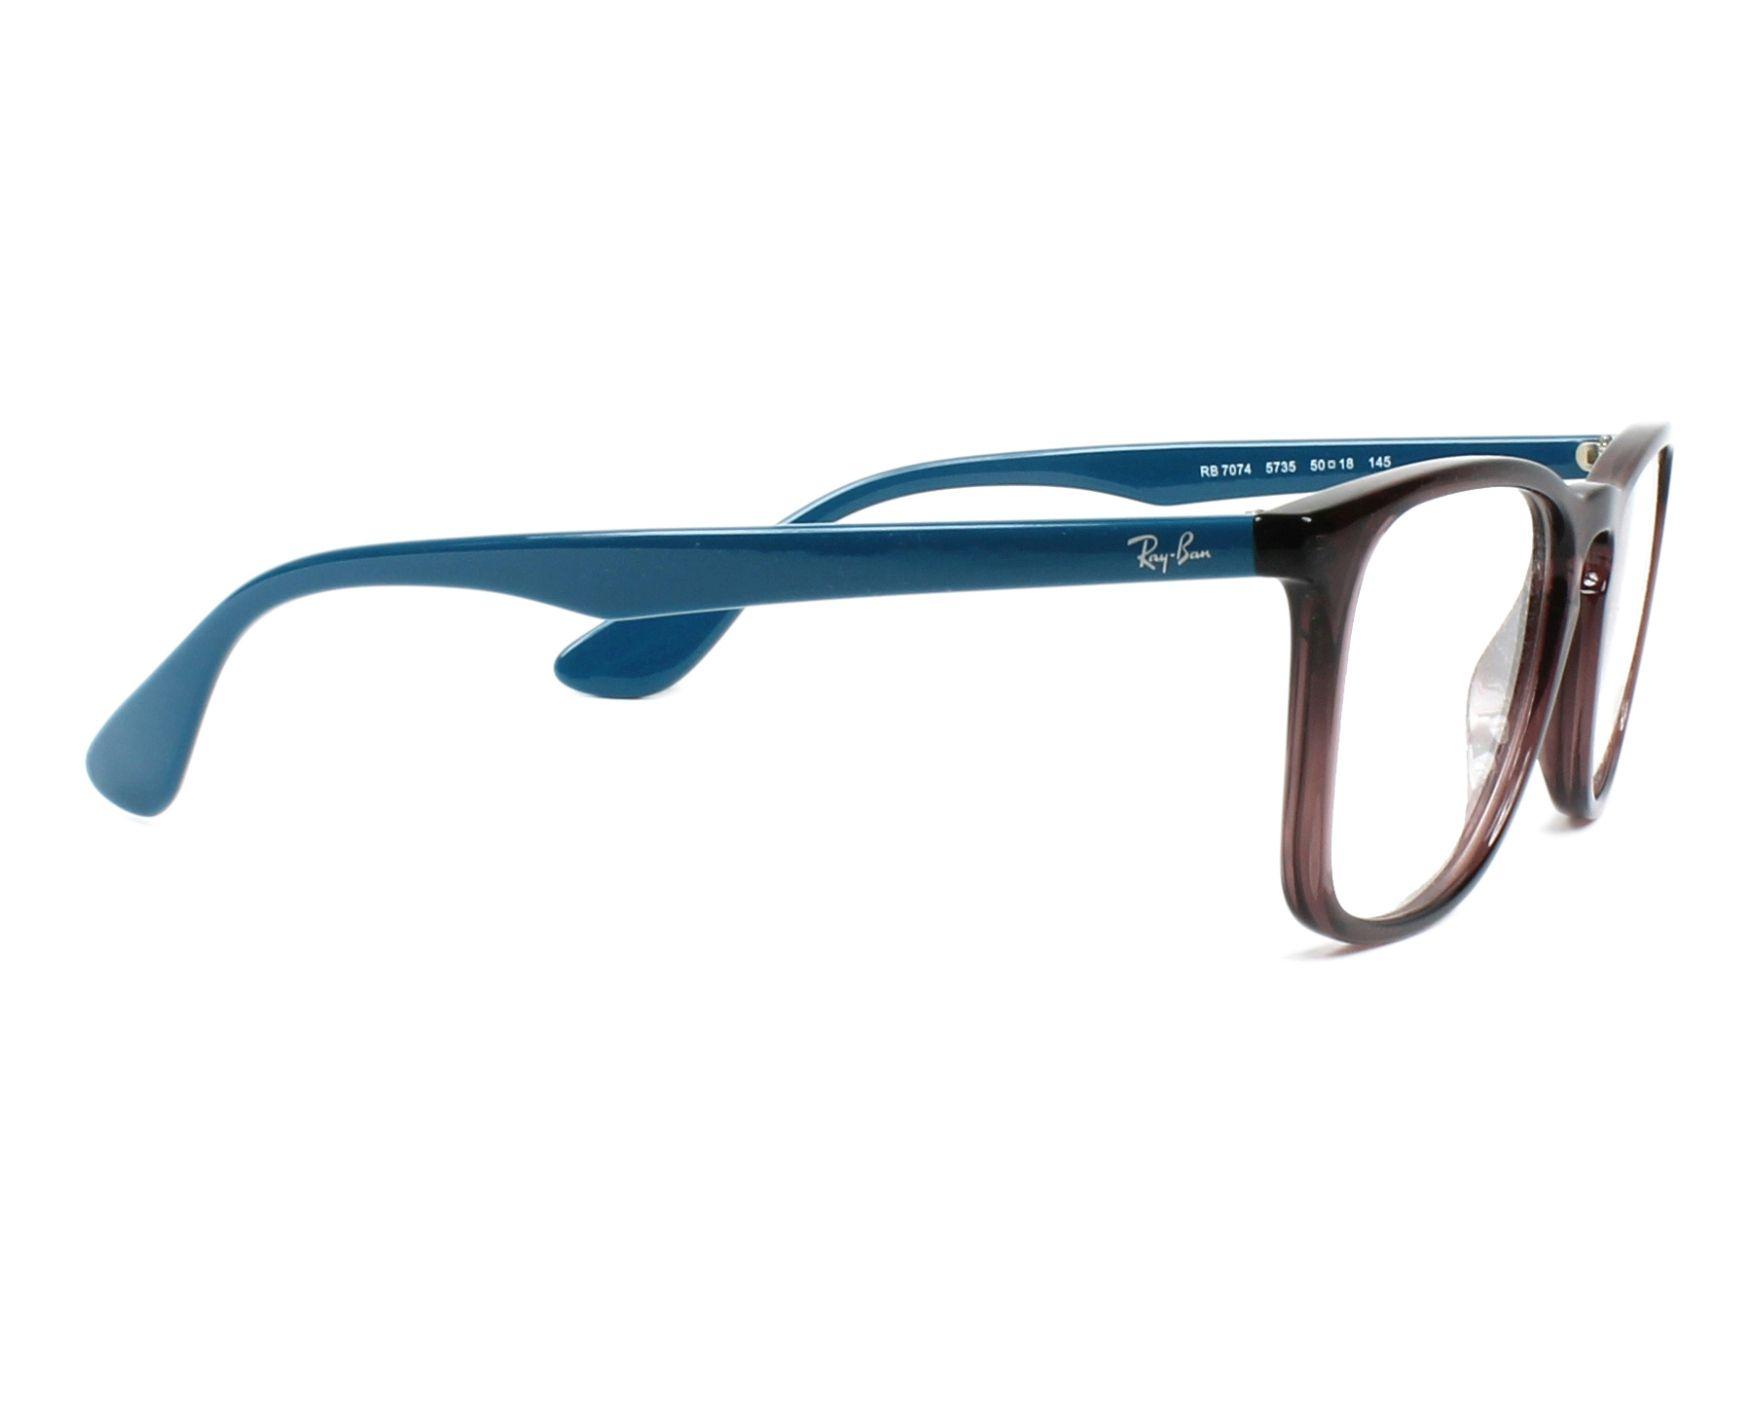 36e4b0e592f eyeglasses Ray-Ban RX-7074 5735 50-18 Purple Turquoise side view